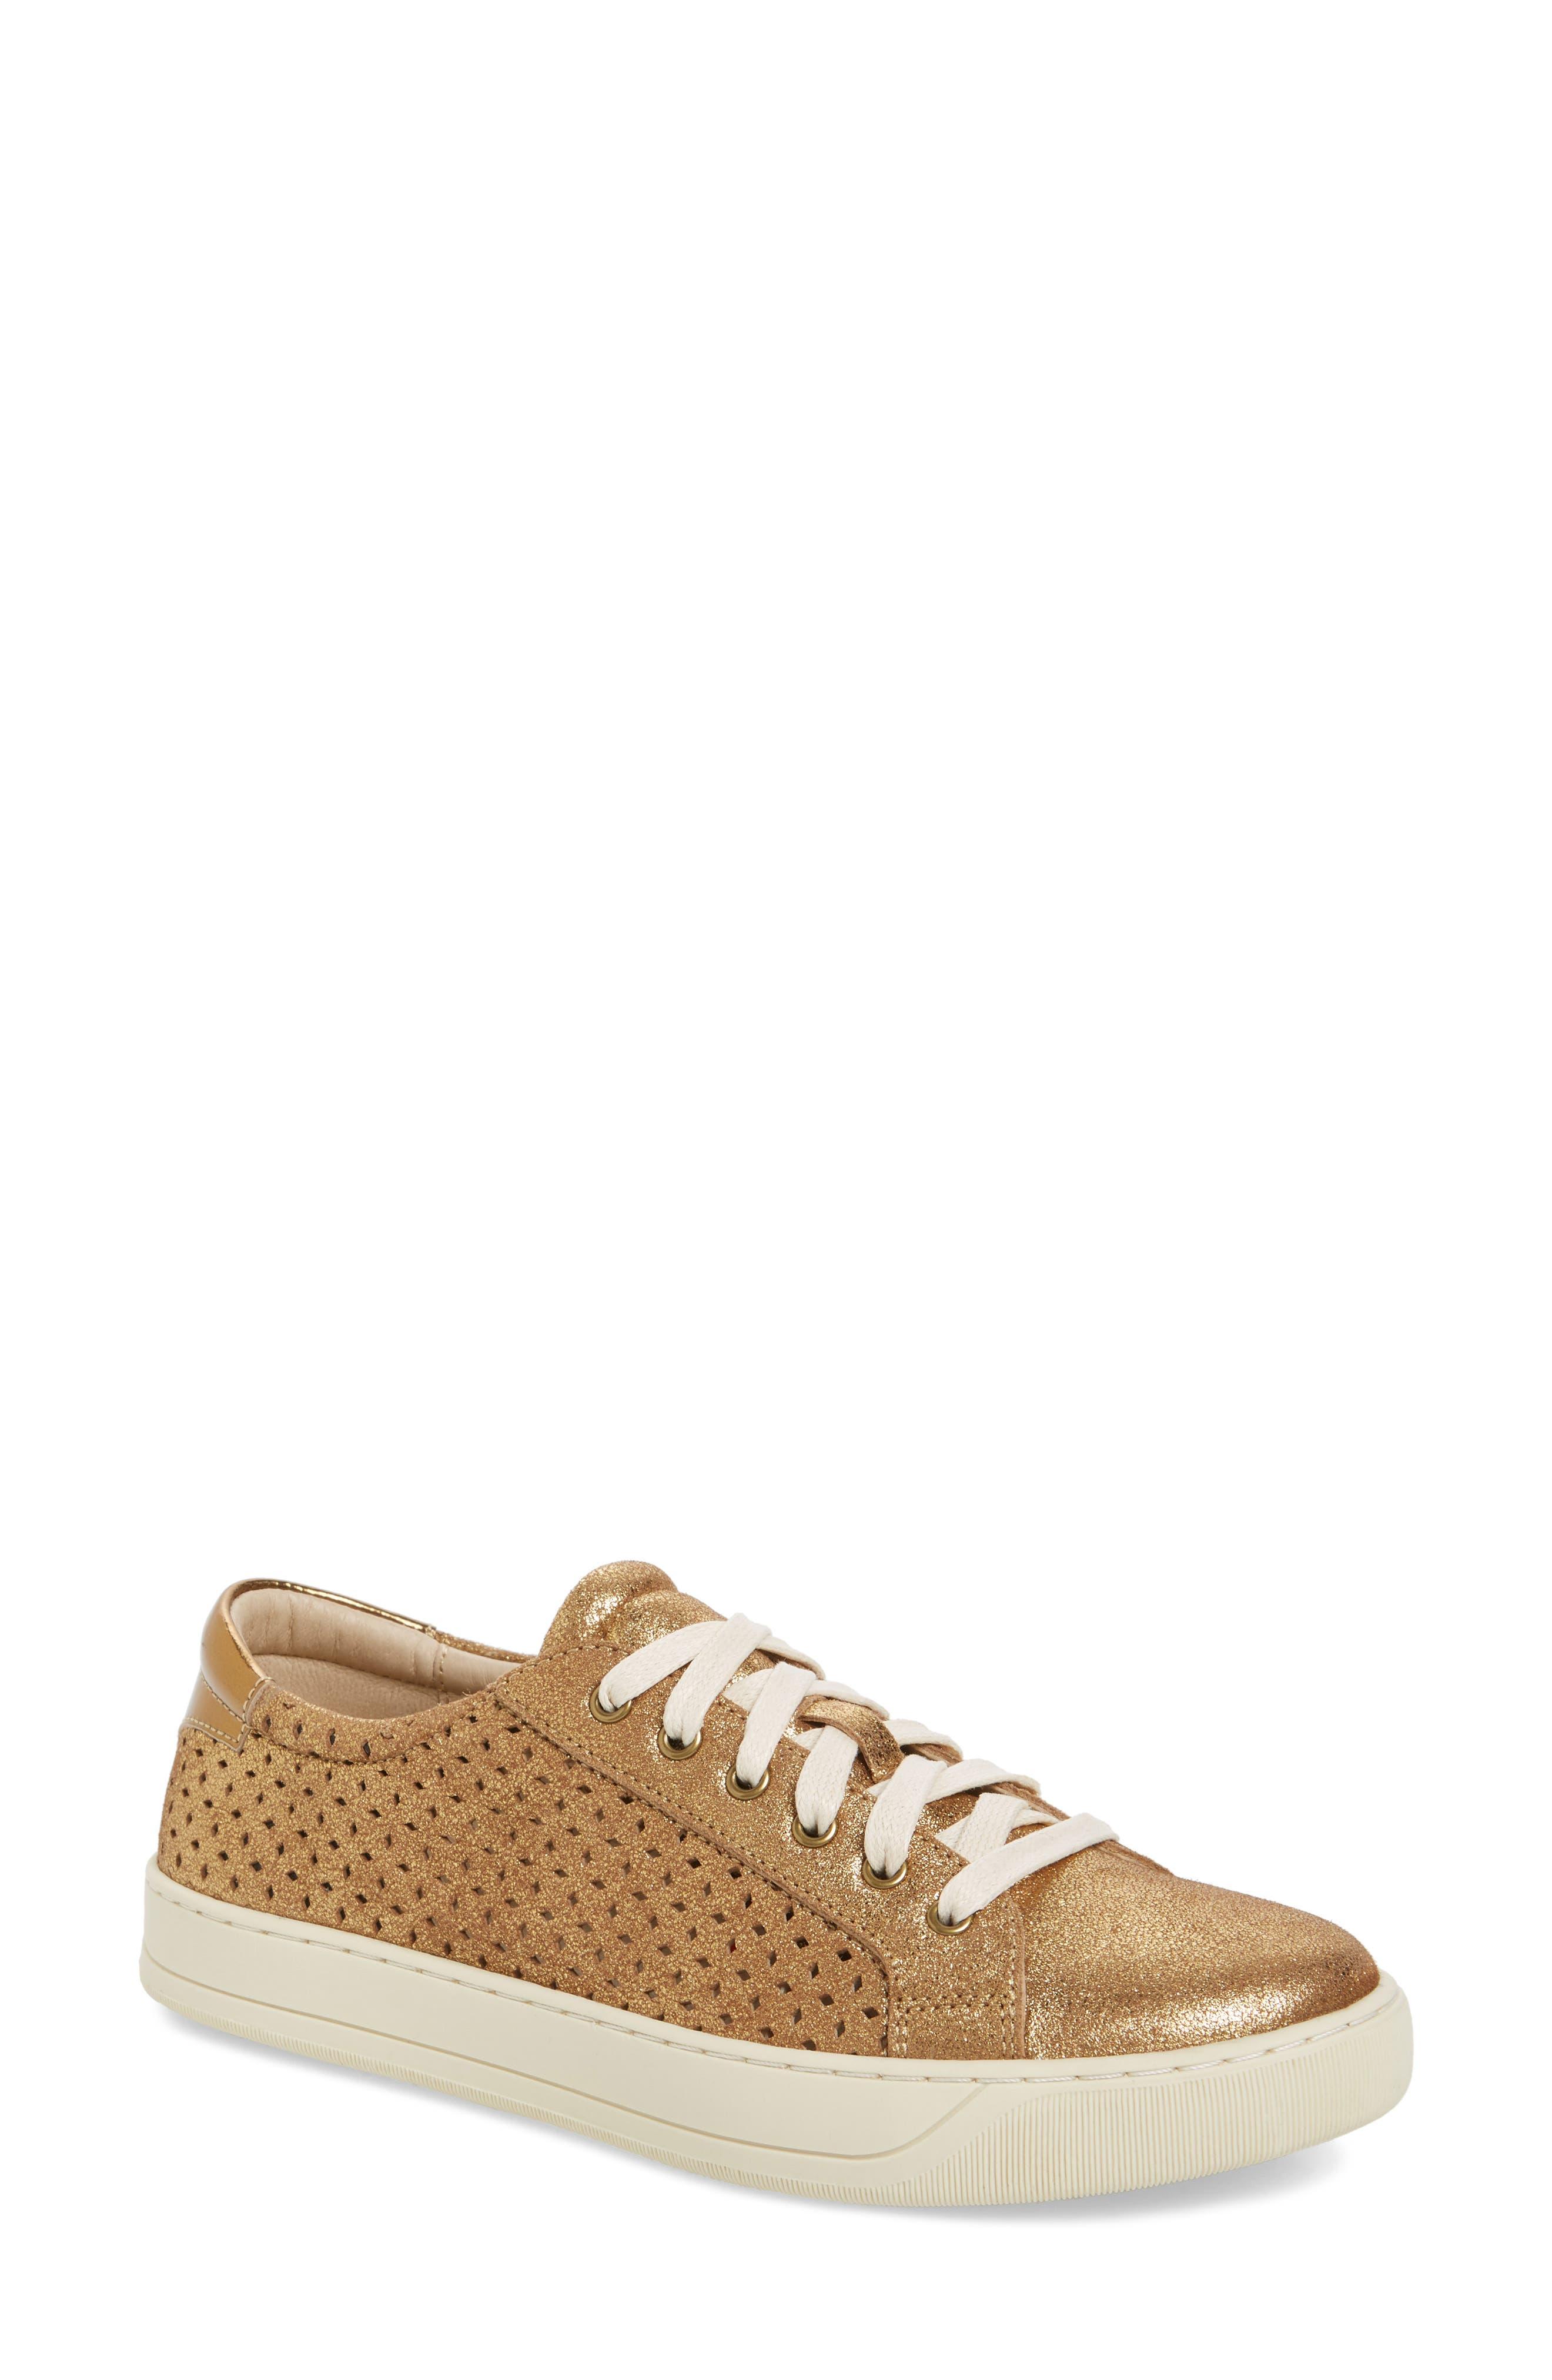 Main Image - Johnston & Murphy Emerson Perforated Sneaker (Women)